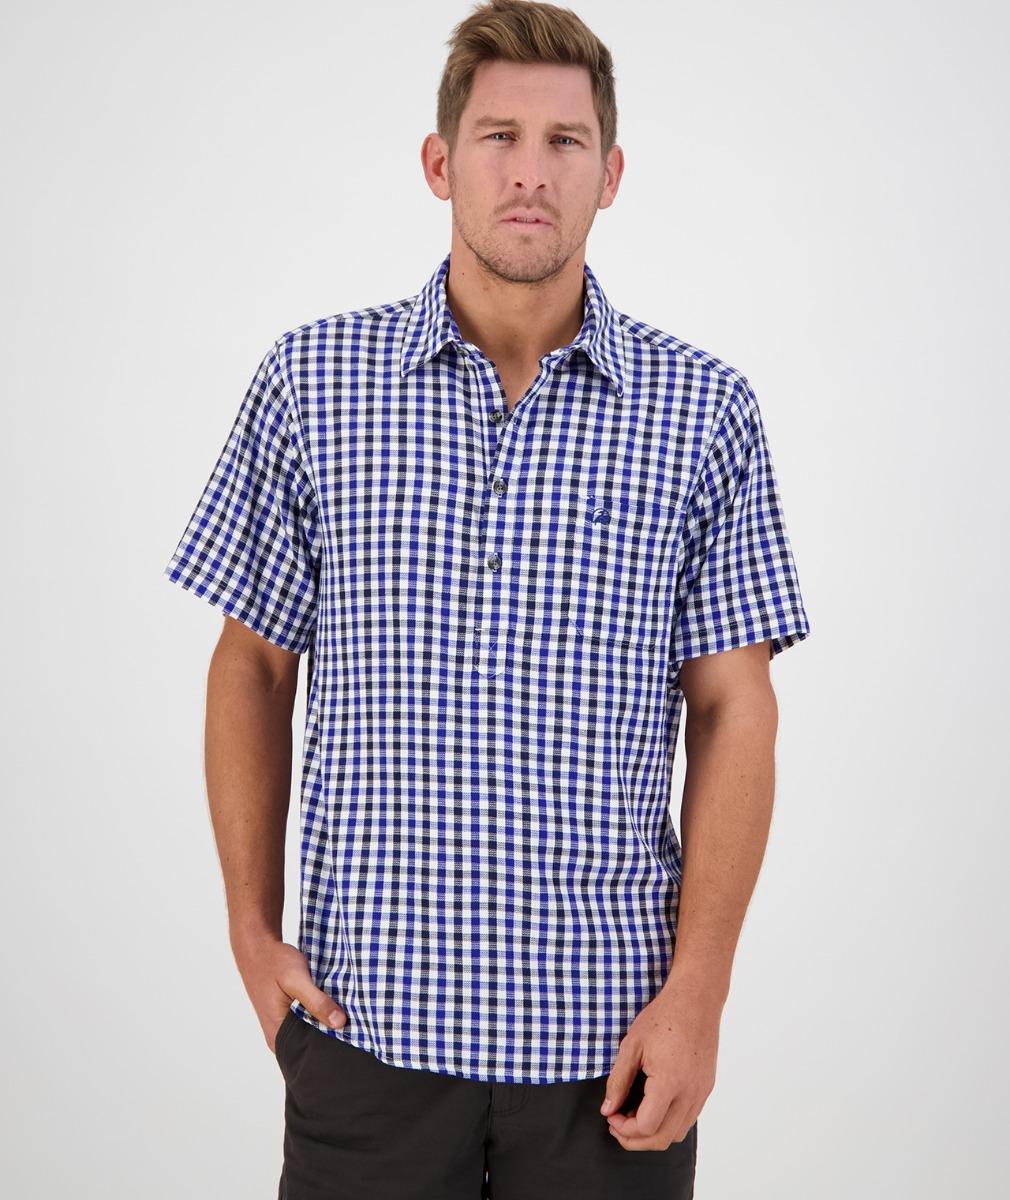 Swanndri Men's Paihia Short Sleeve Shirt in Blue/Navy Check